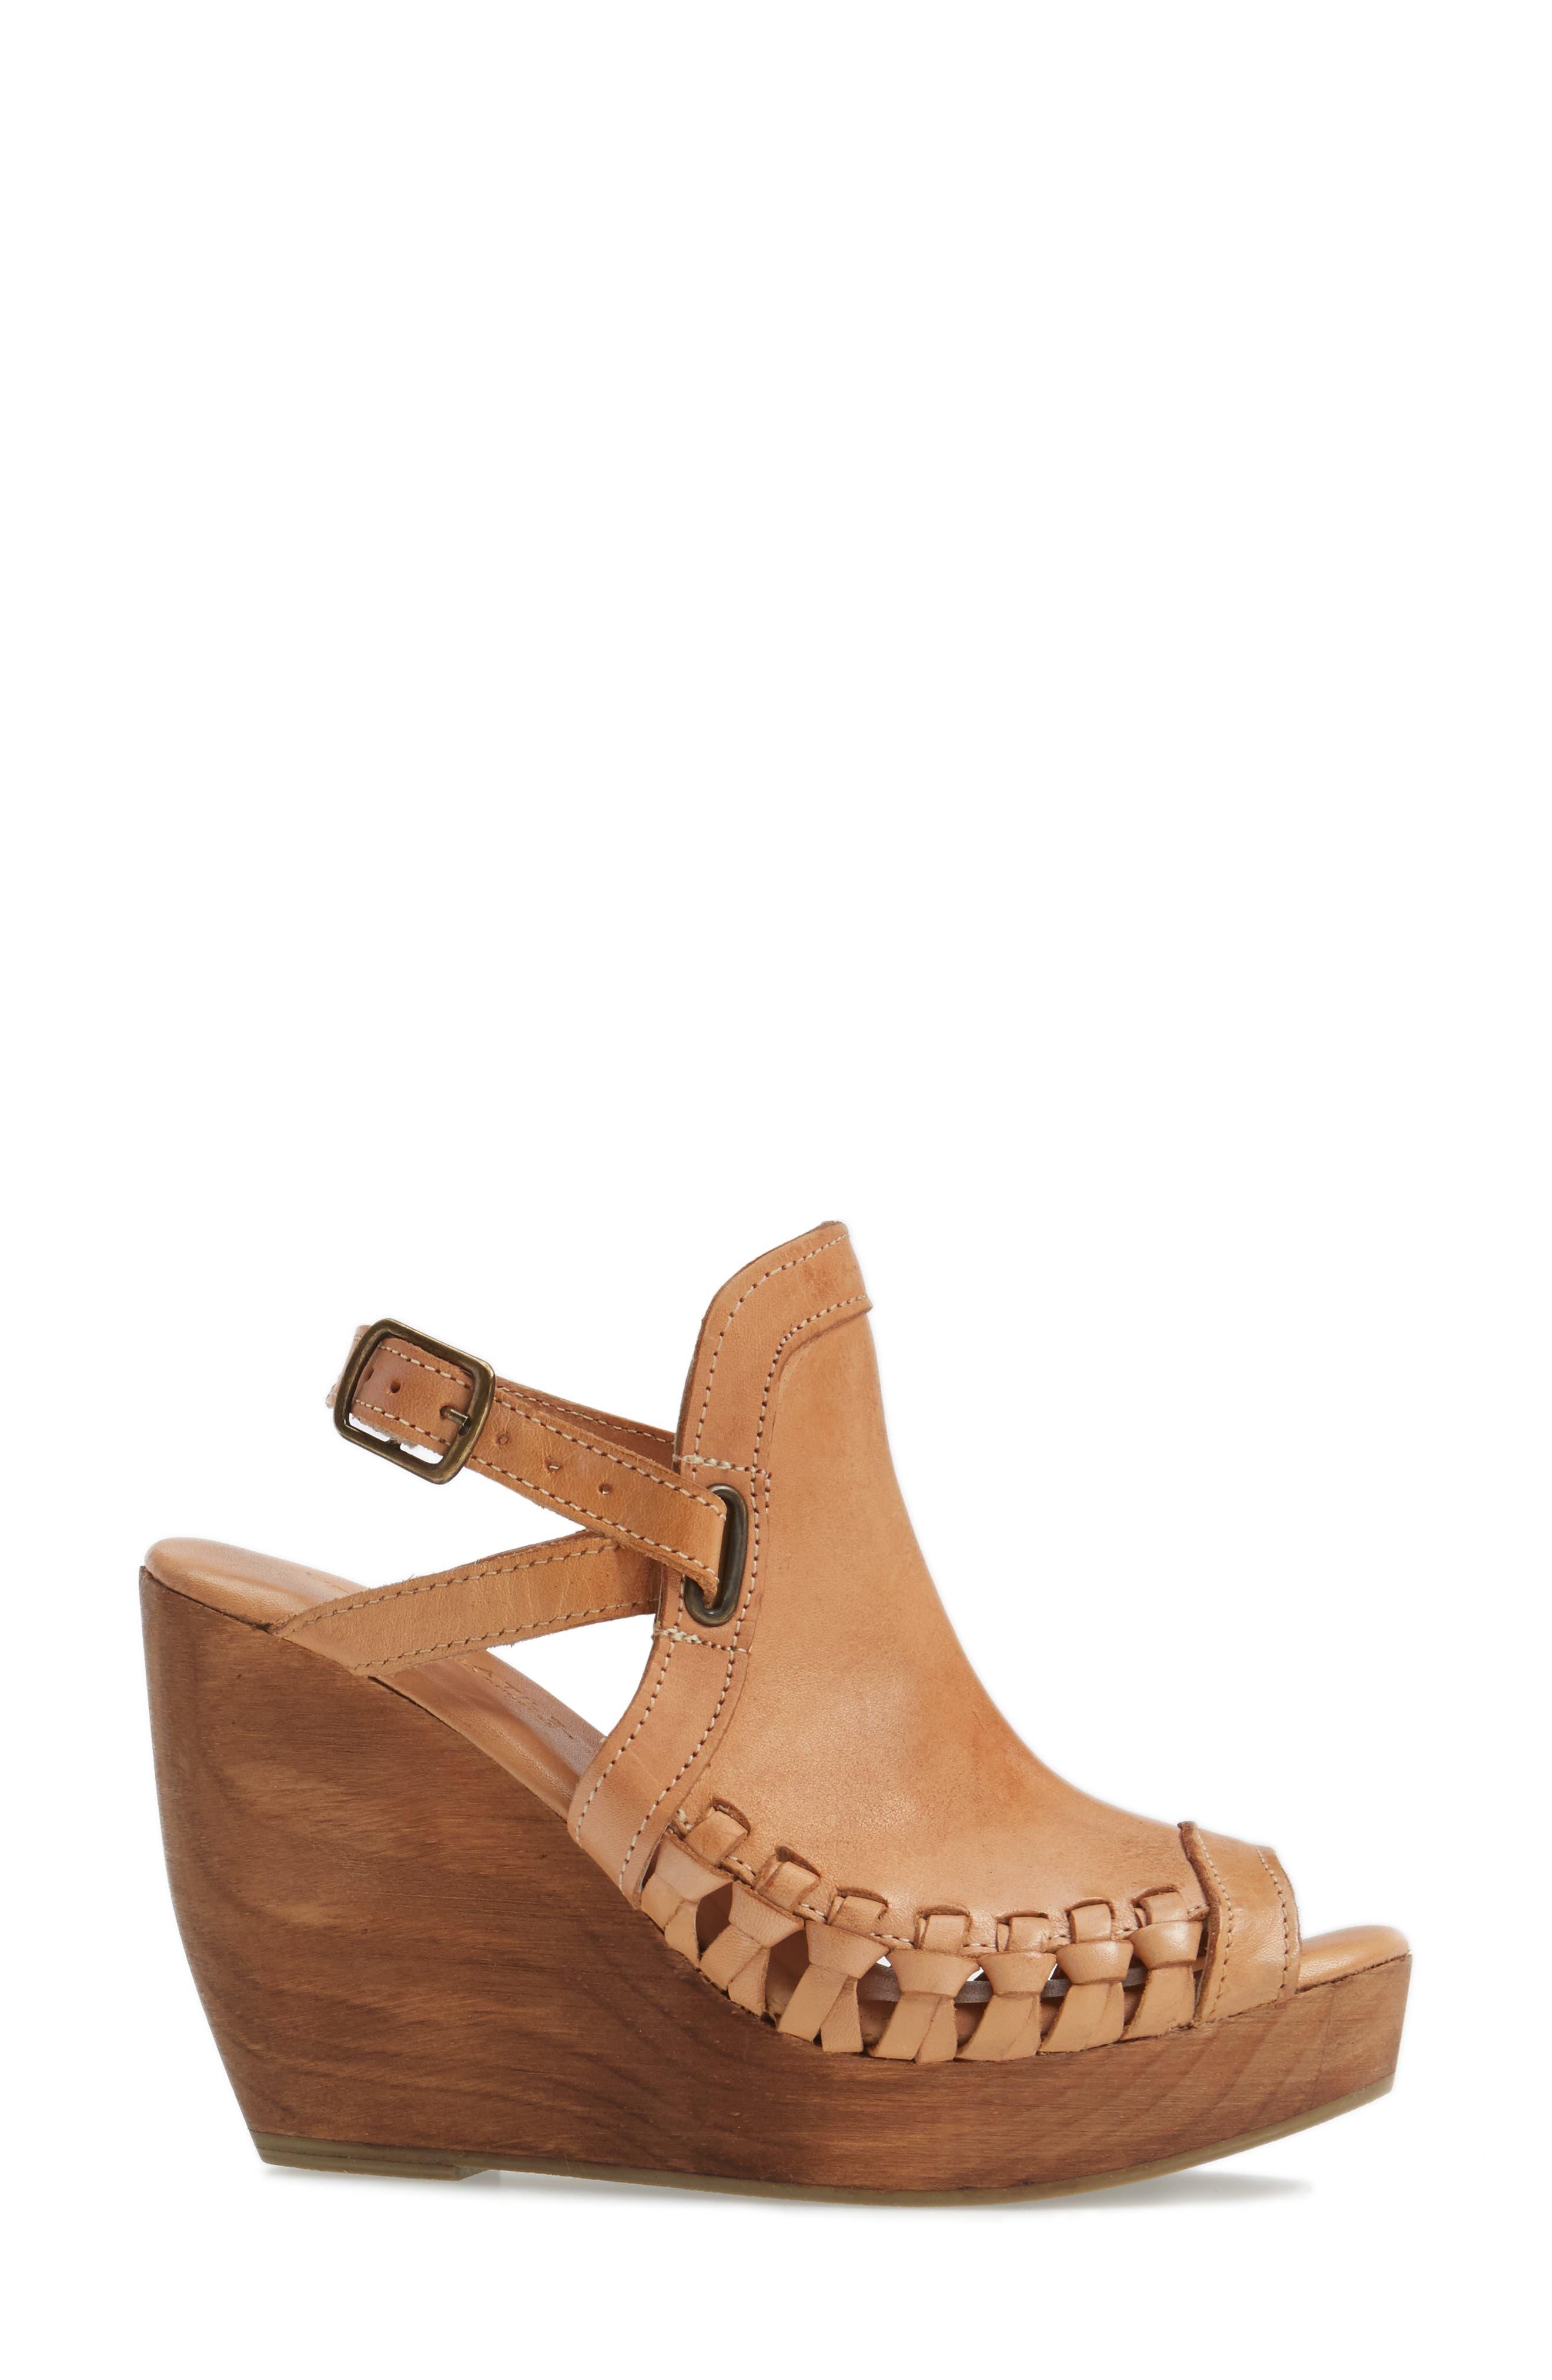 Alternate Image 3  - Very Volatile Carry Wedge Sandal (Women)